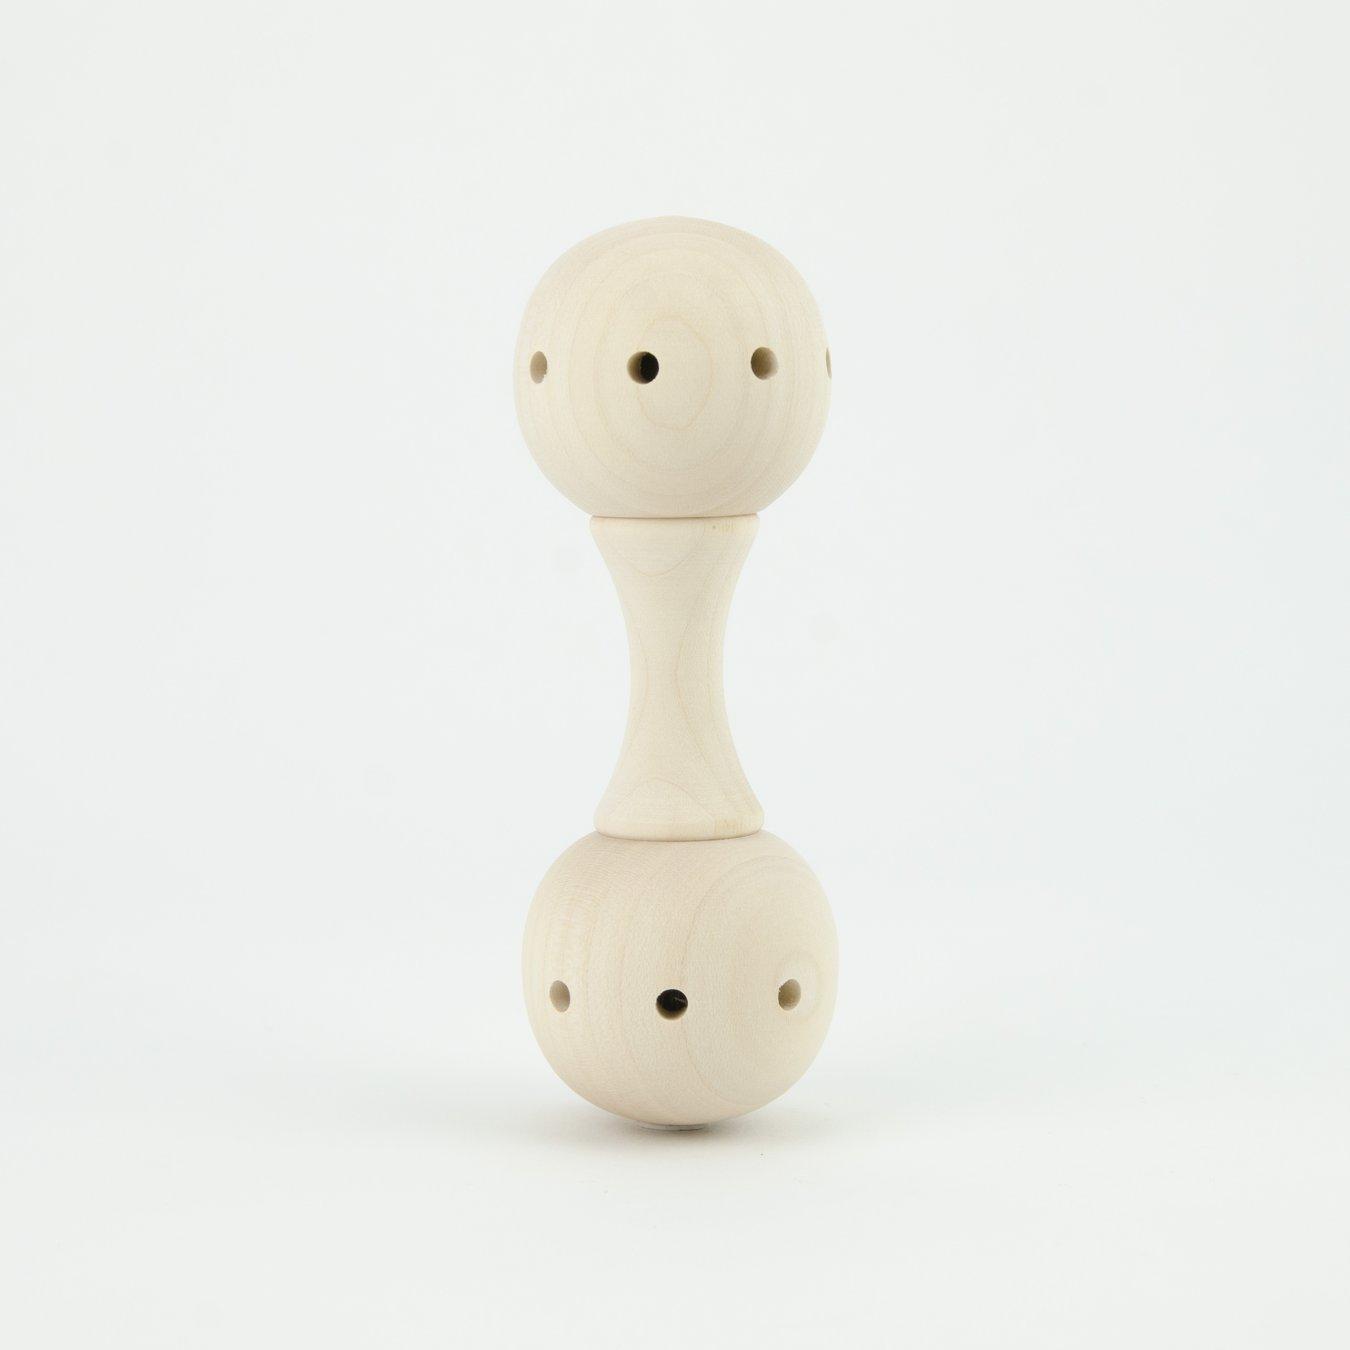 Chocalho | Mader Kreiselmanufaktur